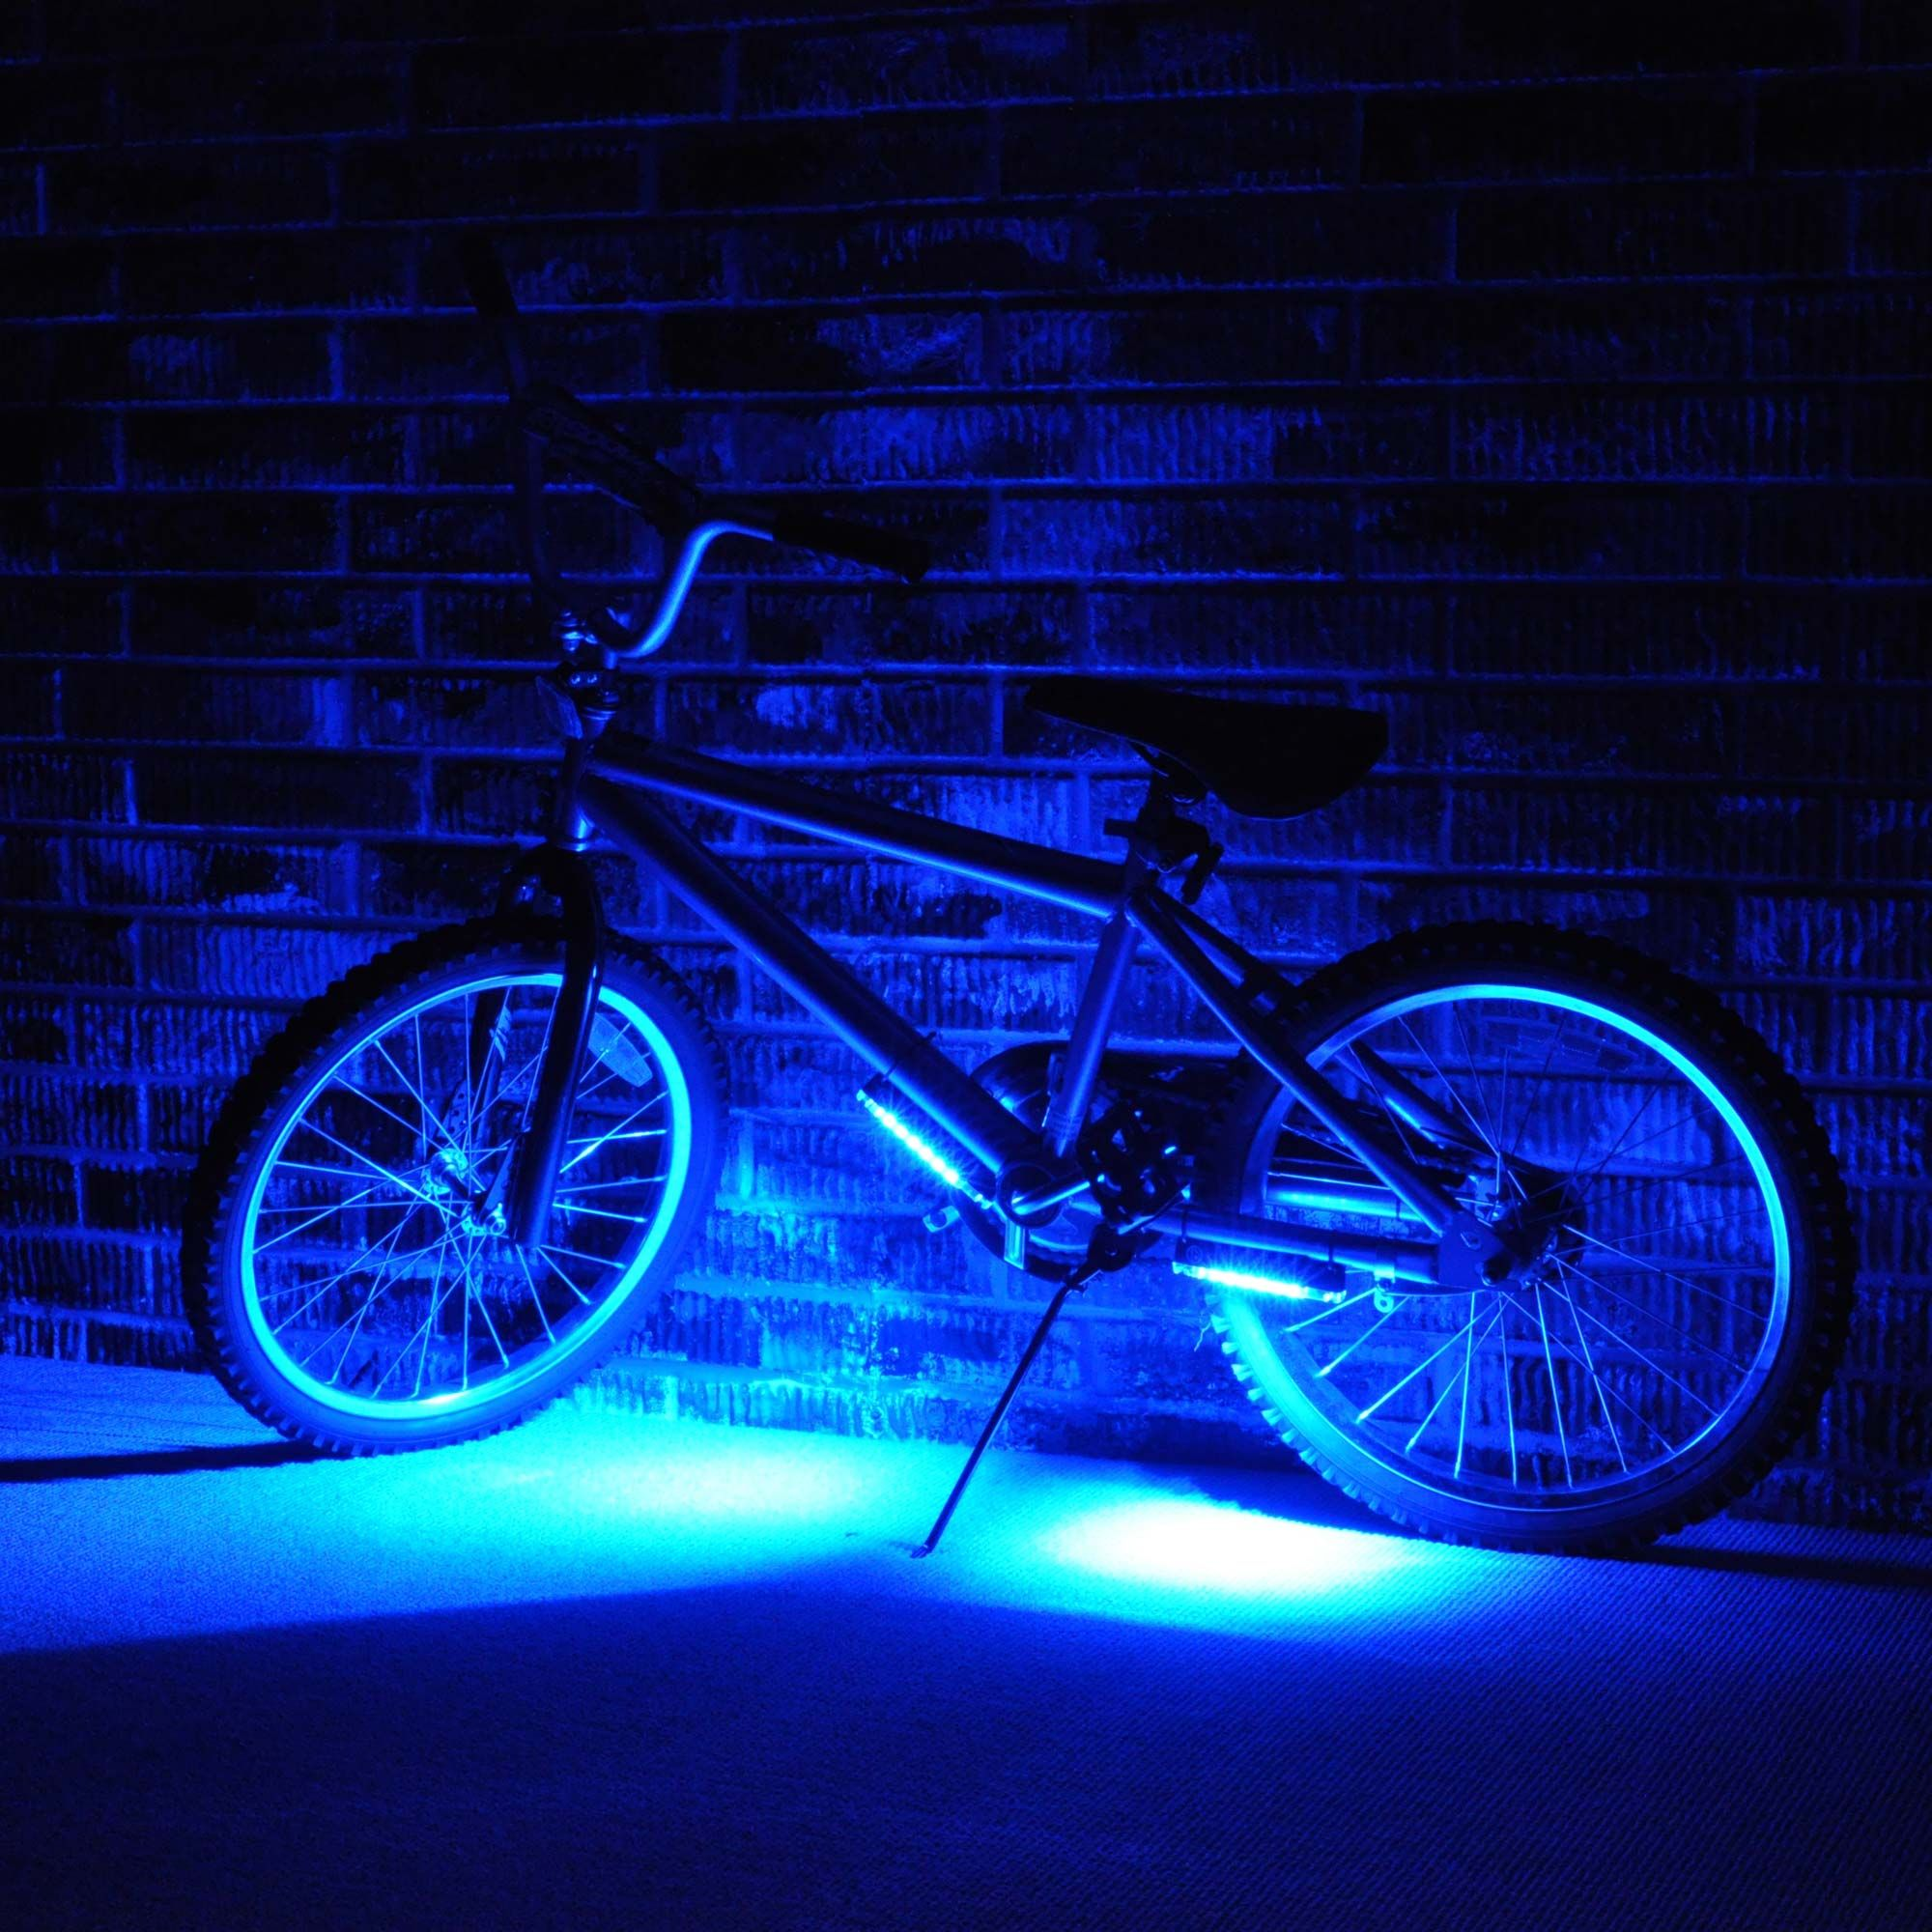 Brightz Ltd Go Brightz Led Bicycle Light